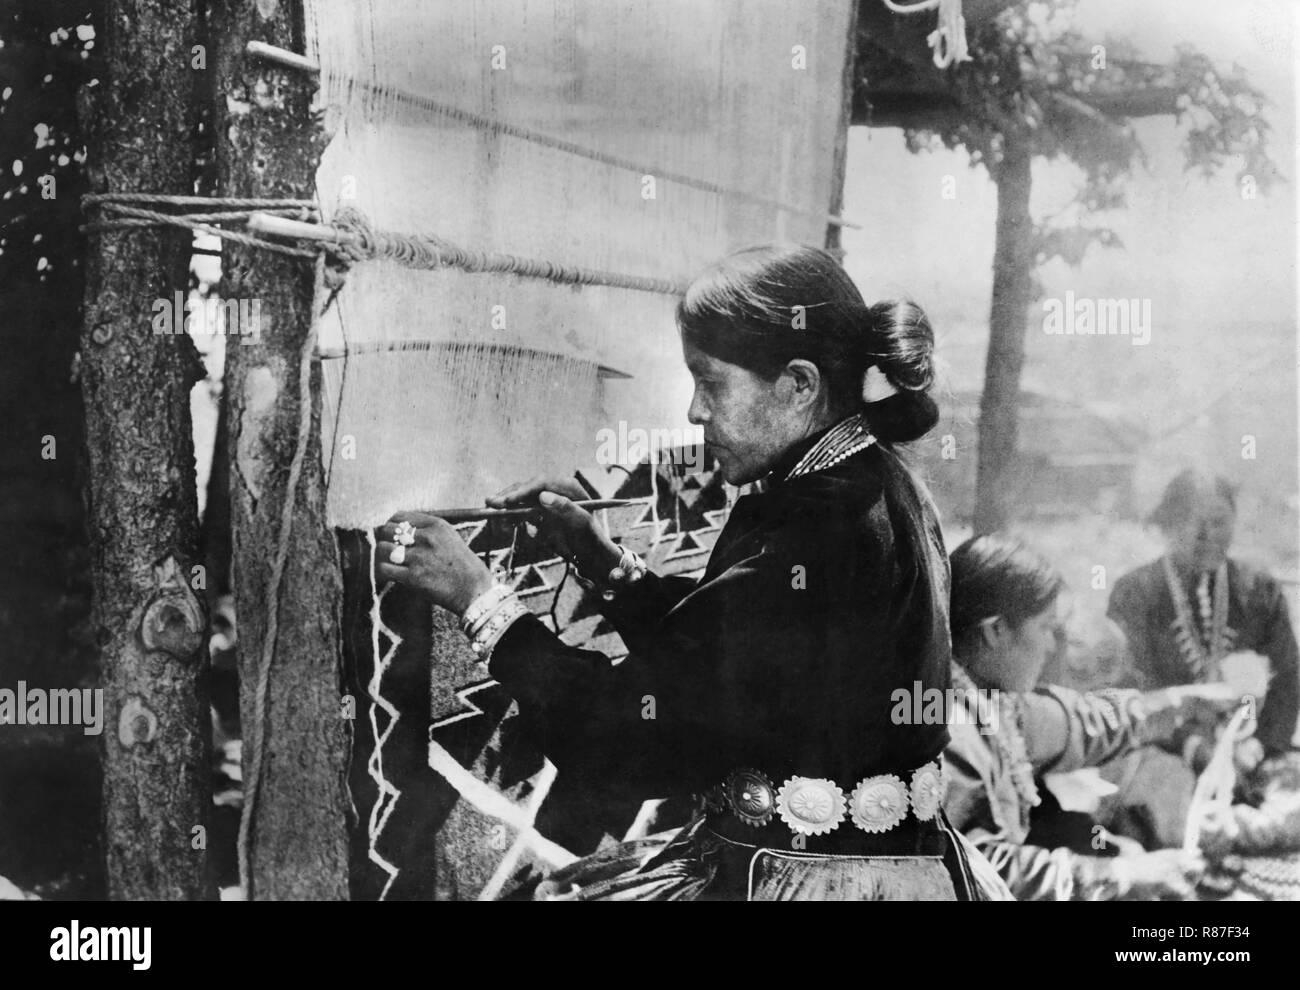 Navajo Women Weaving, National Photo Company, 1910 - Stock Image